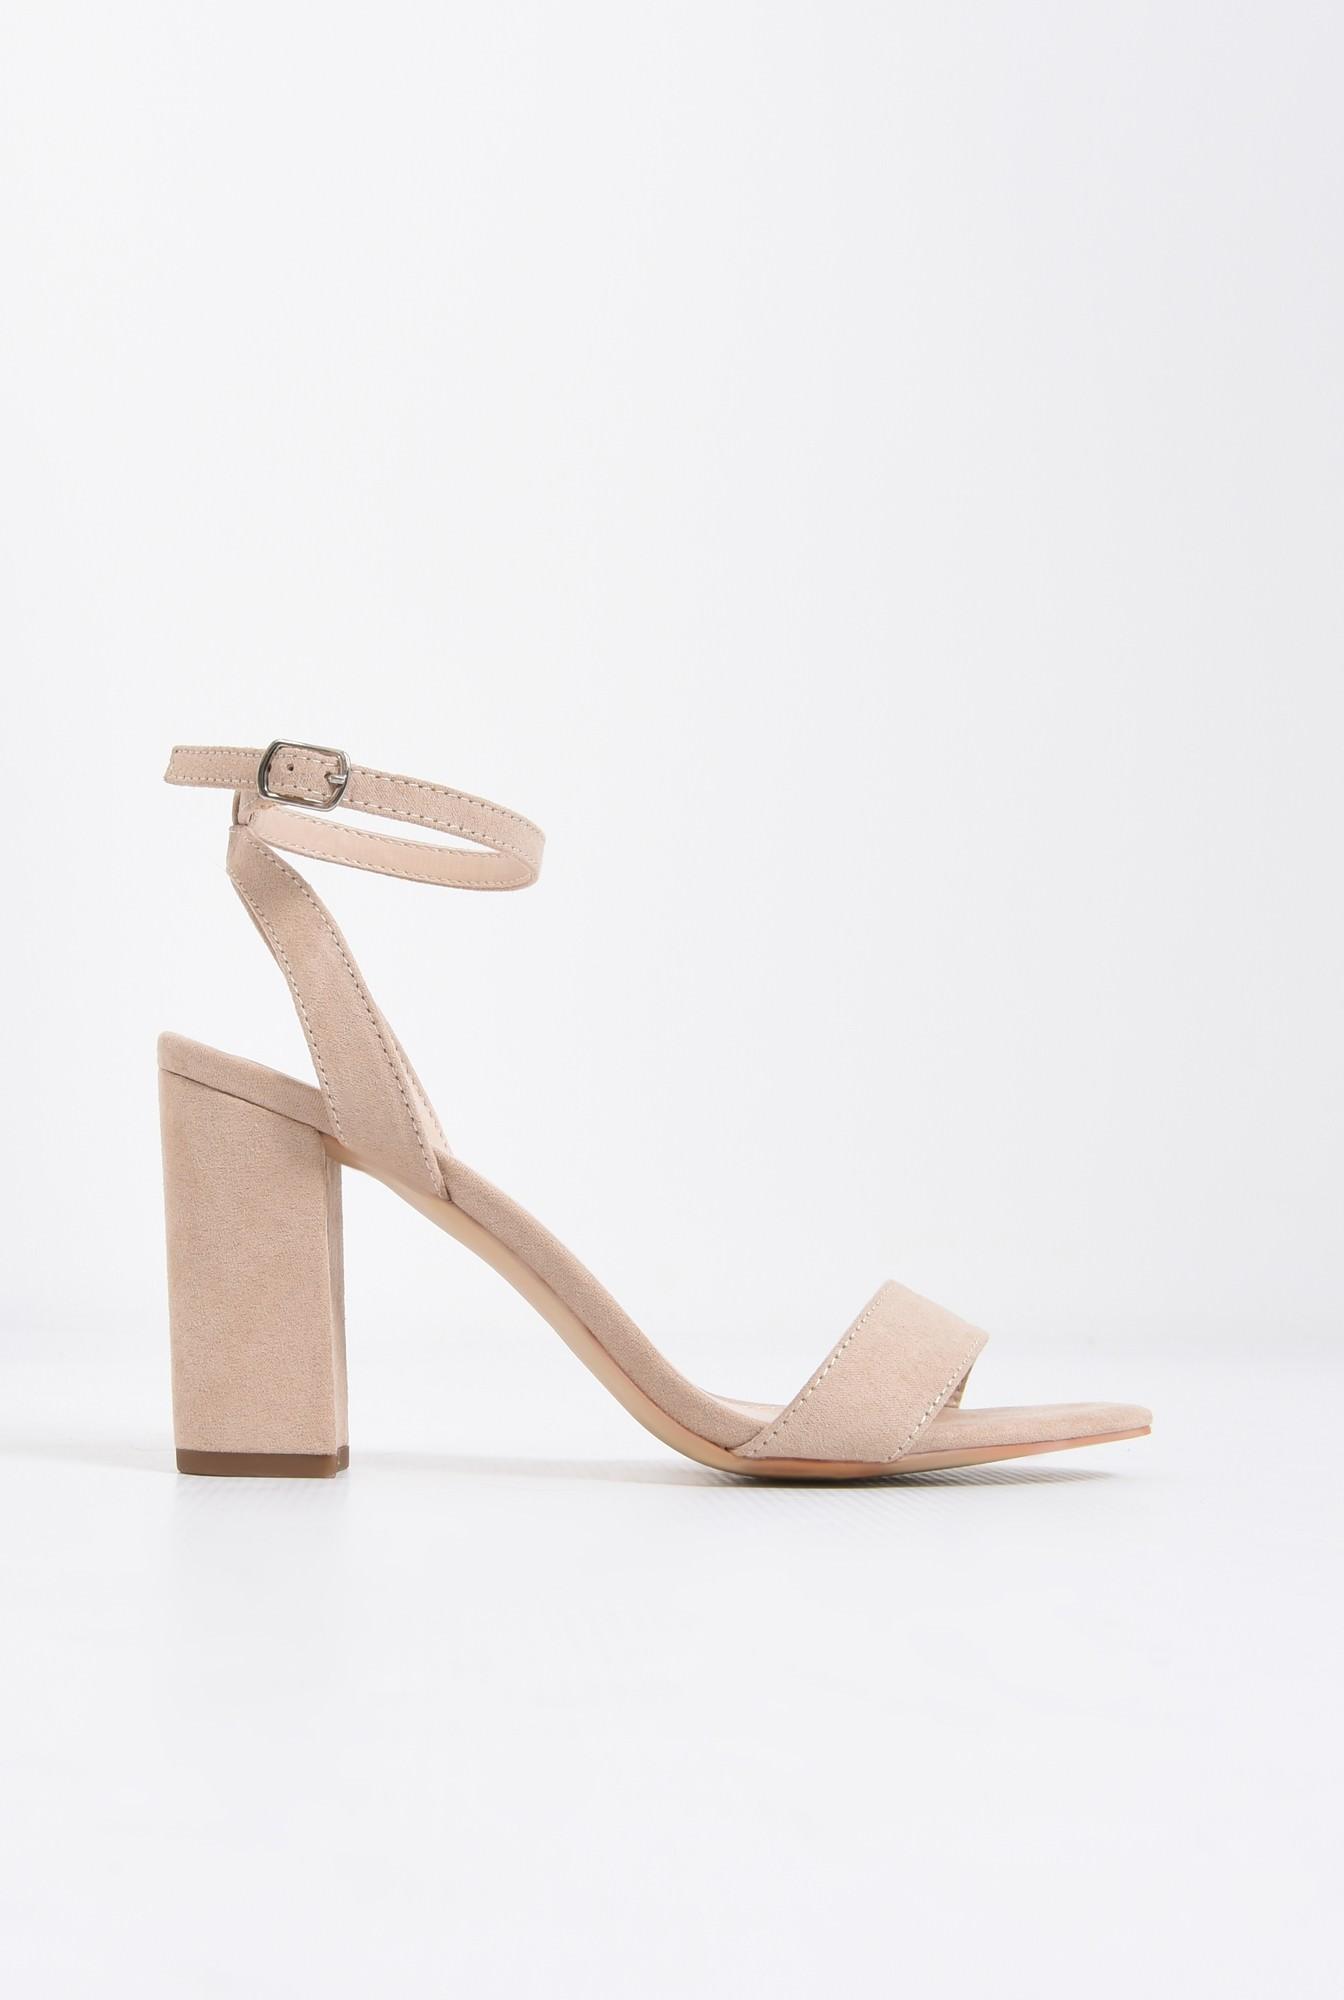 sandale elegante, crem, toc gros, piele intoarsa eco